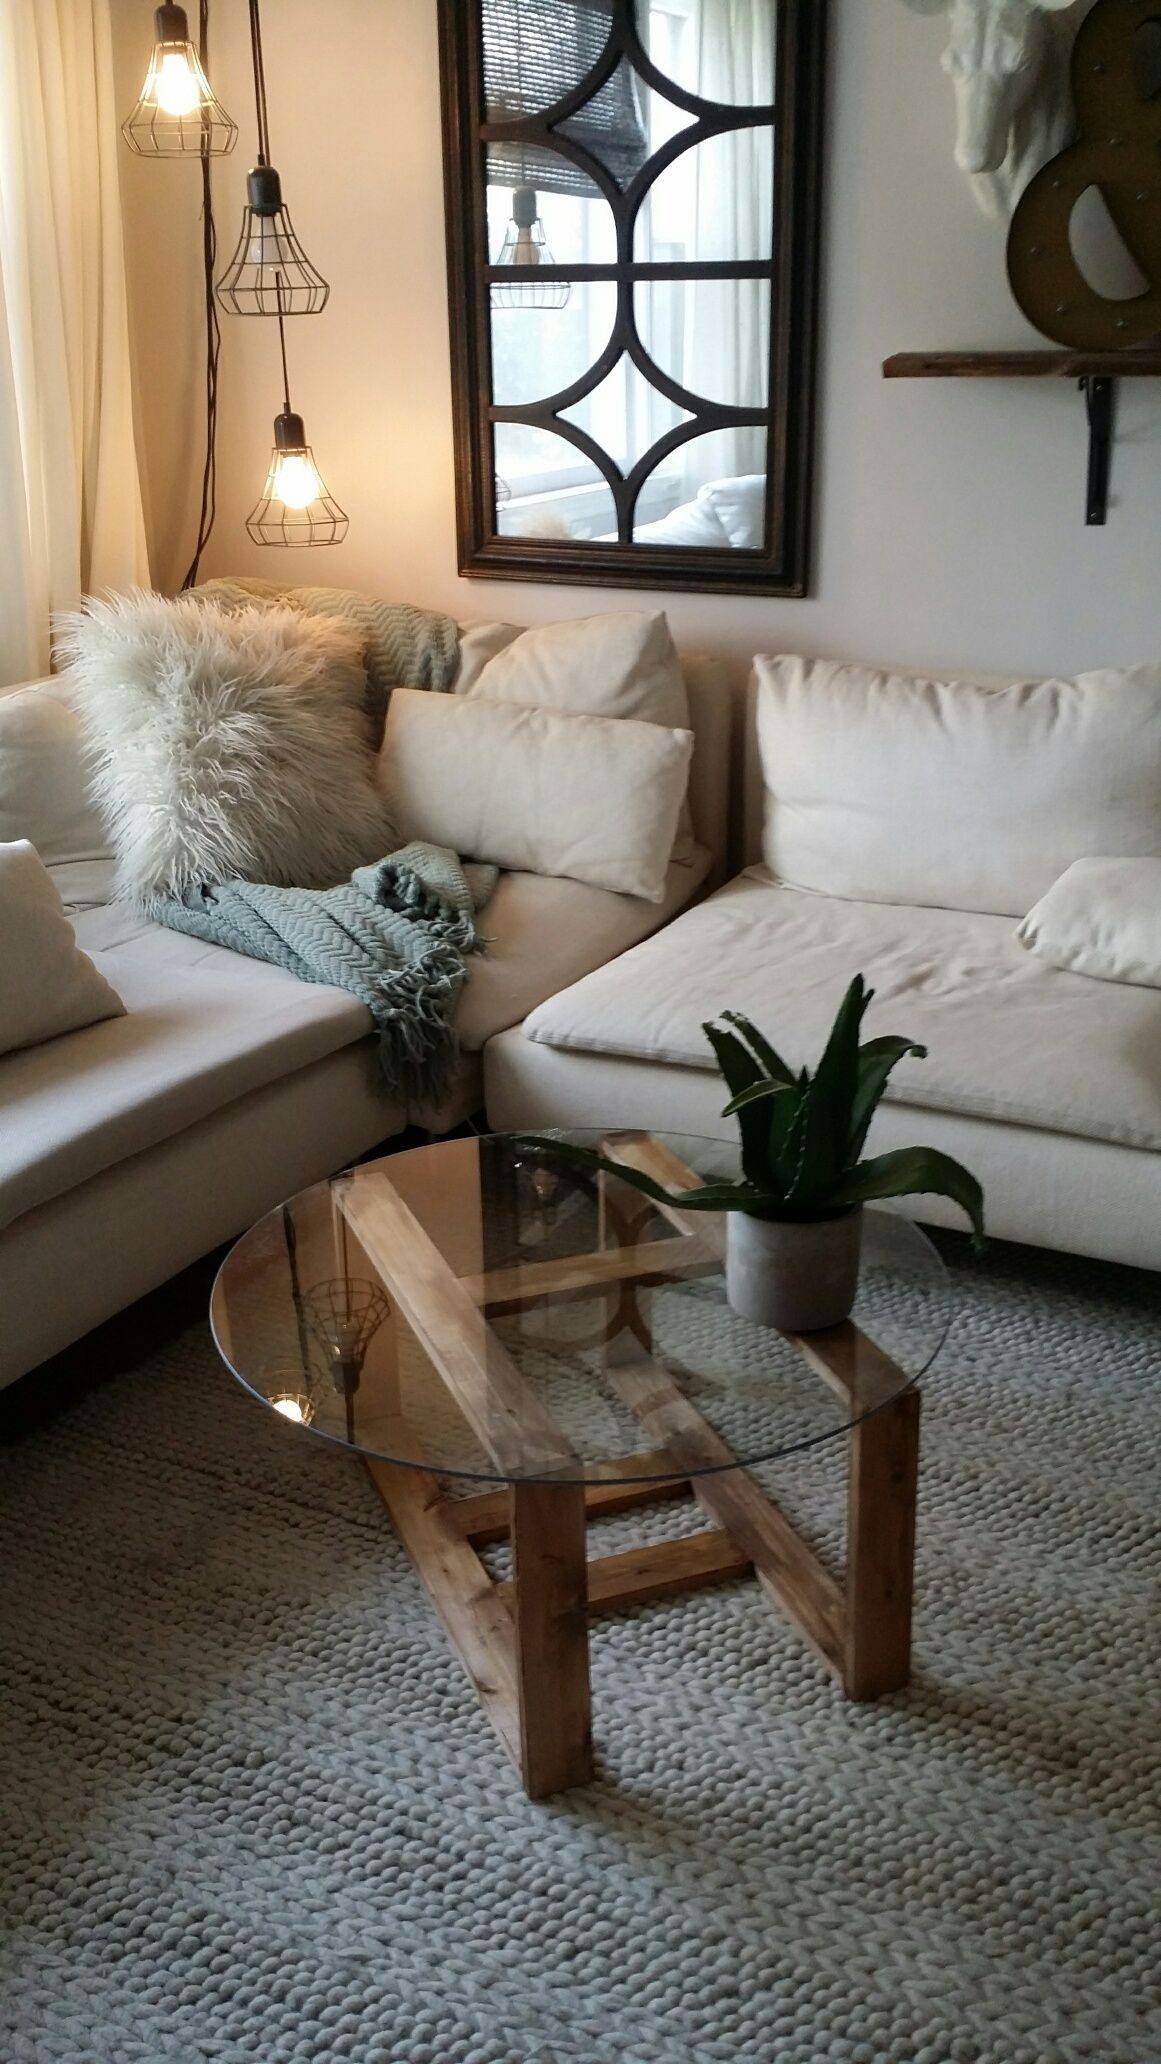 Glass coffee table in living room glass coffee table glass and wood coffee table wood coffee table